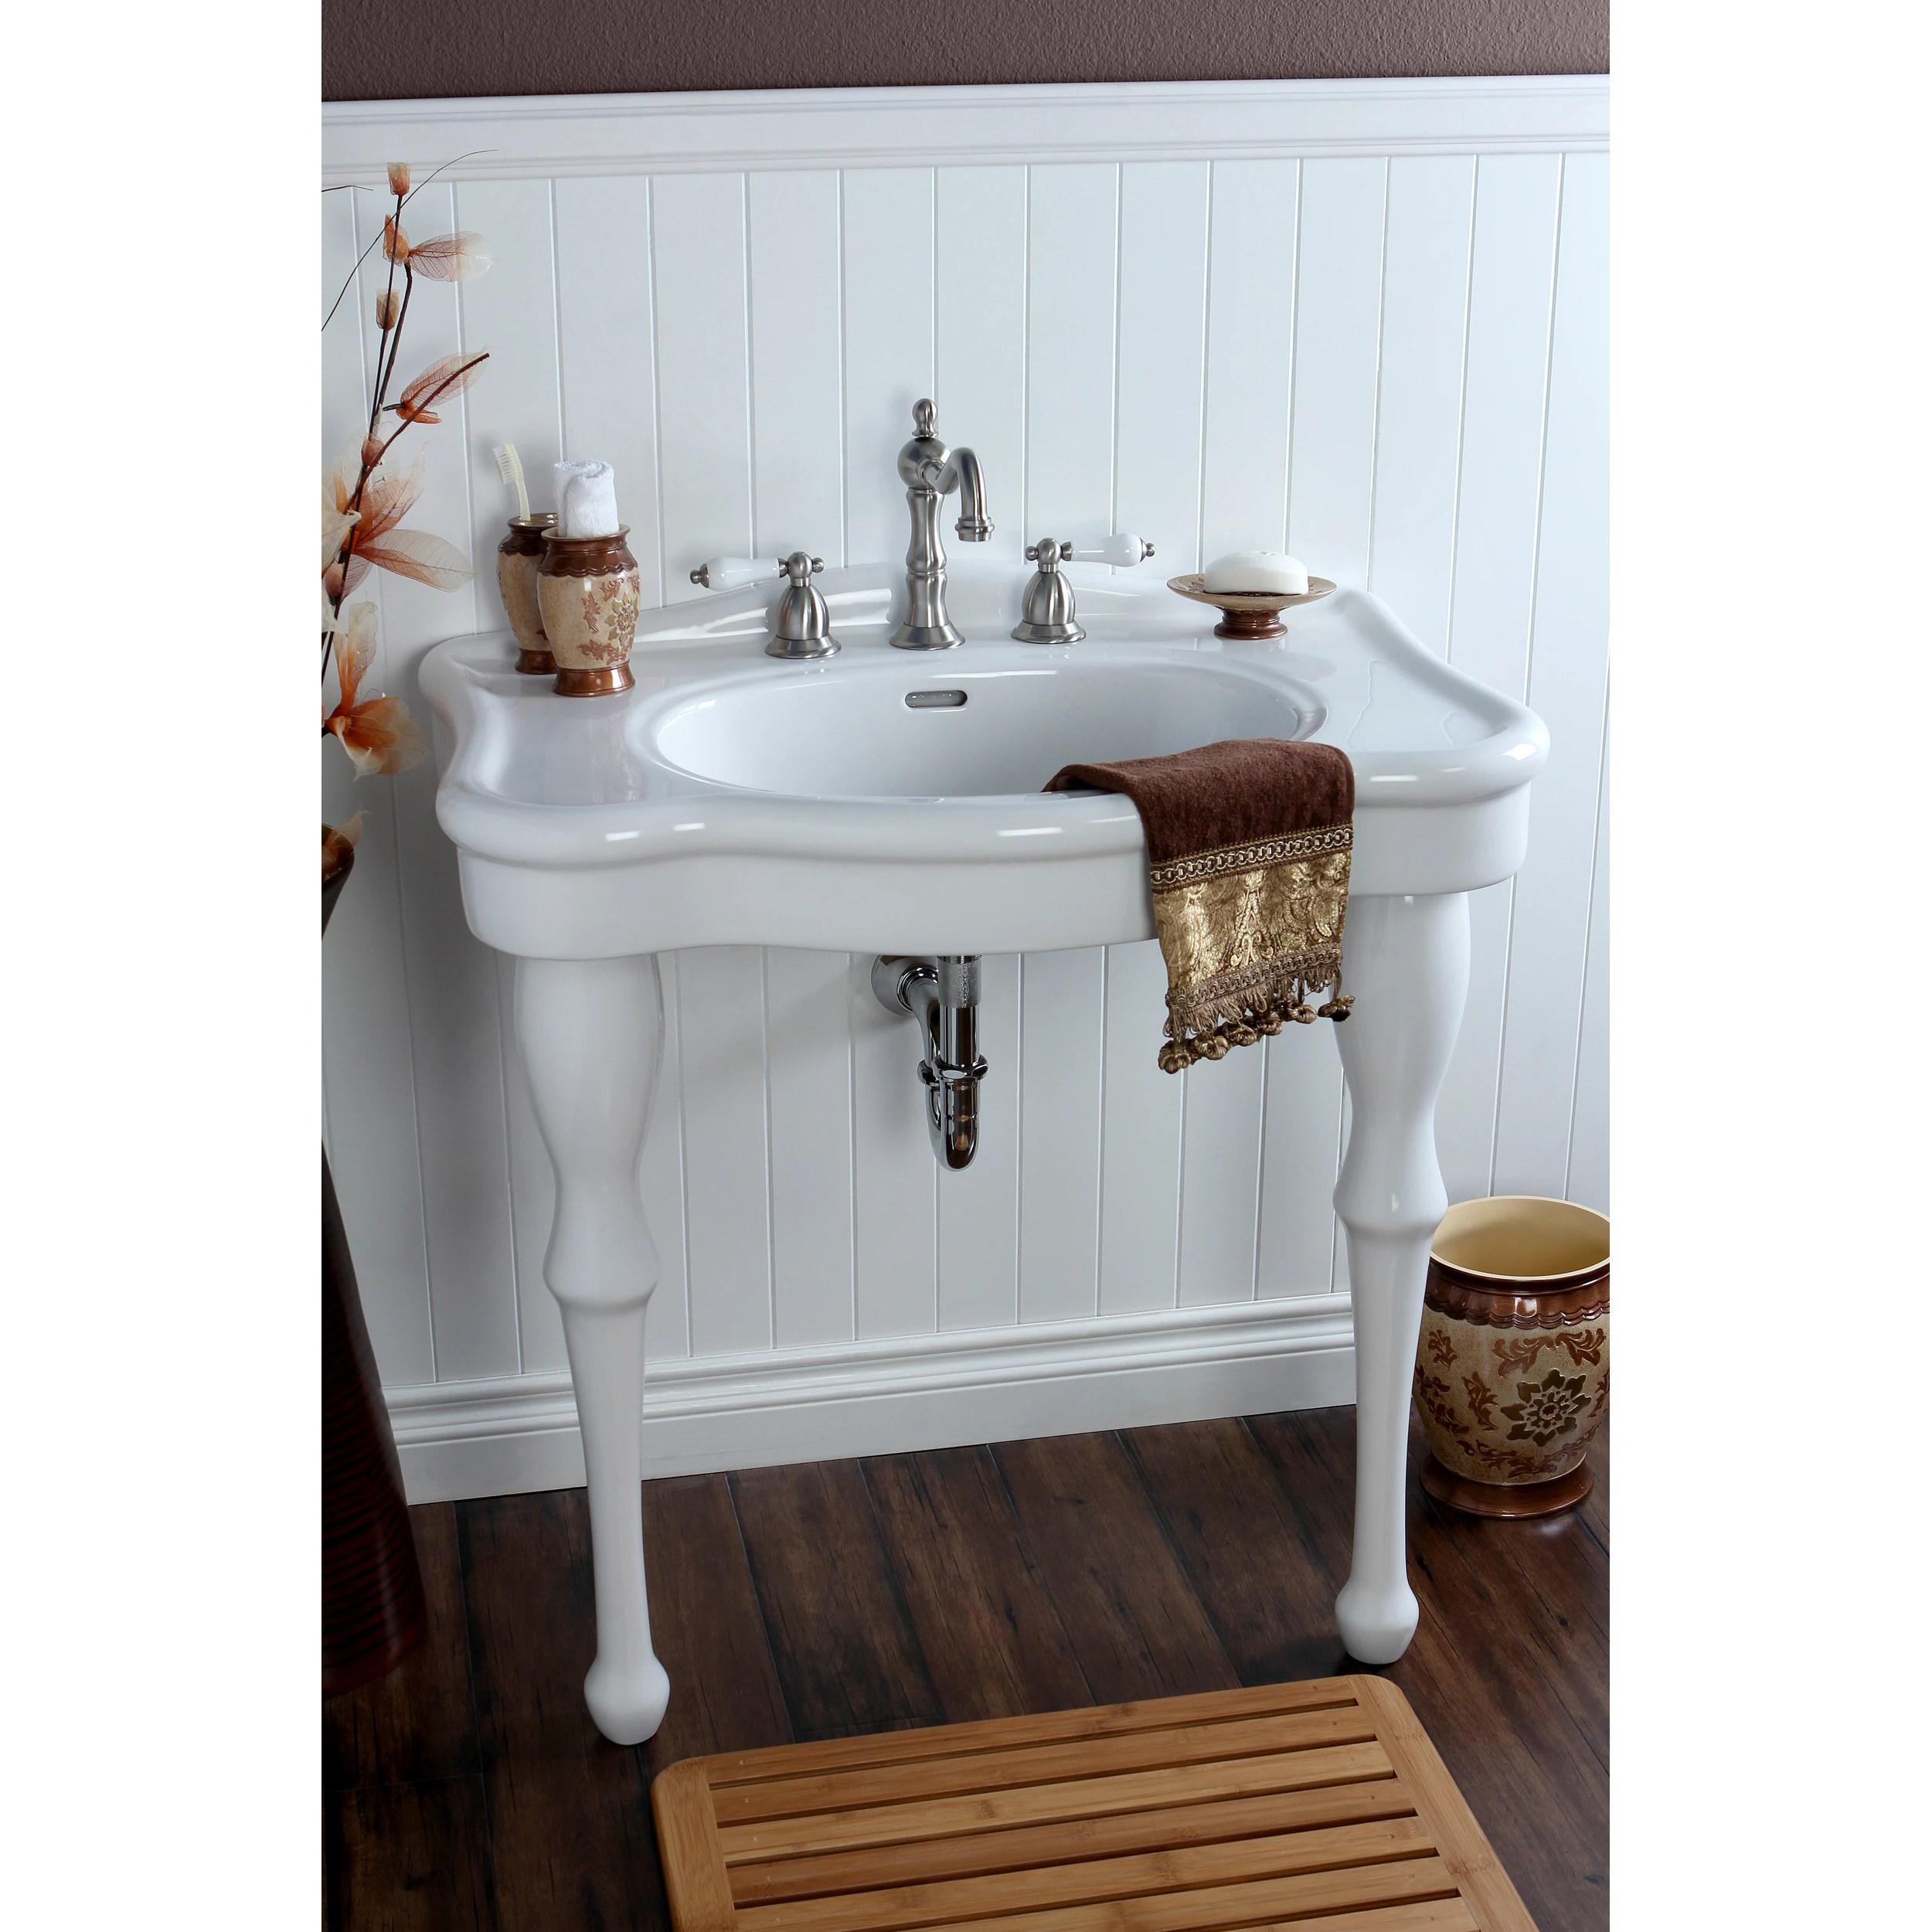 Shop Vintage 32 Inch For 8 Inch Centers Wall Mount Pedestal Bathroom Sink Vanity Overstock 8036002